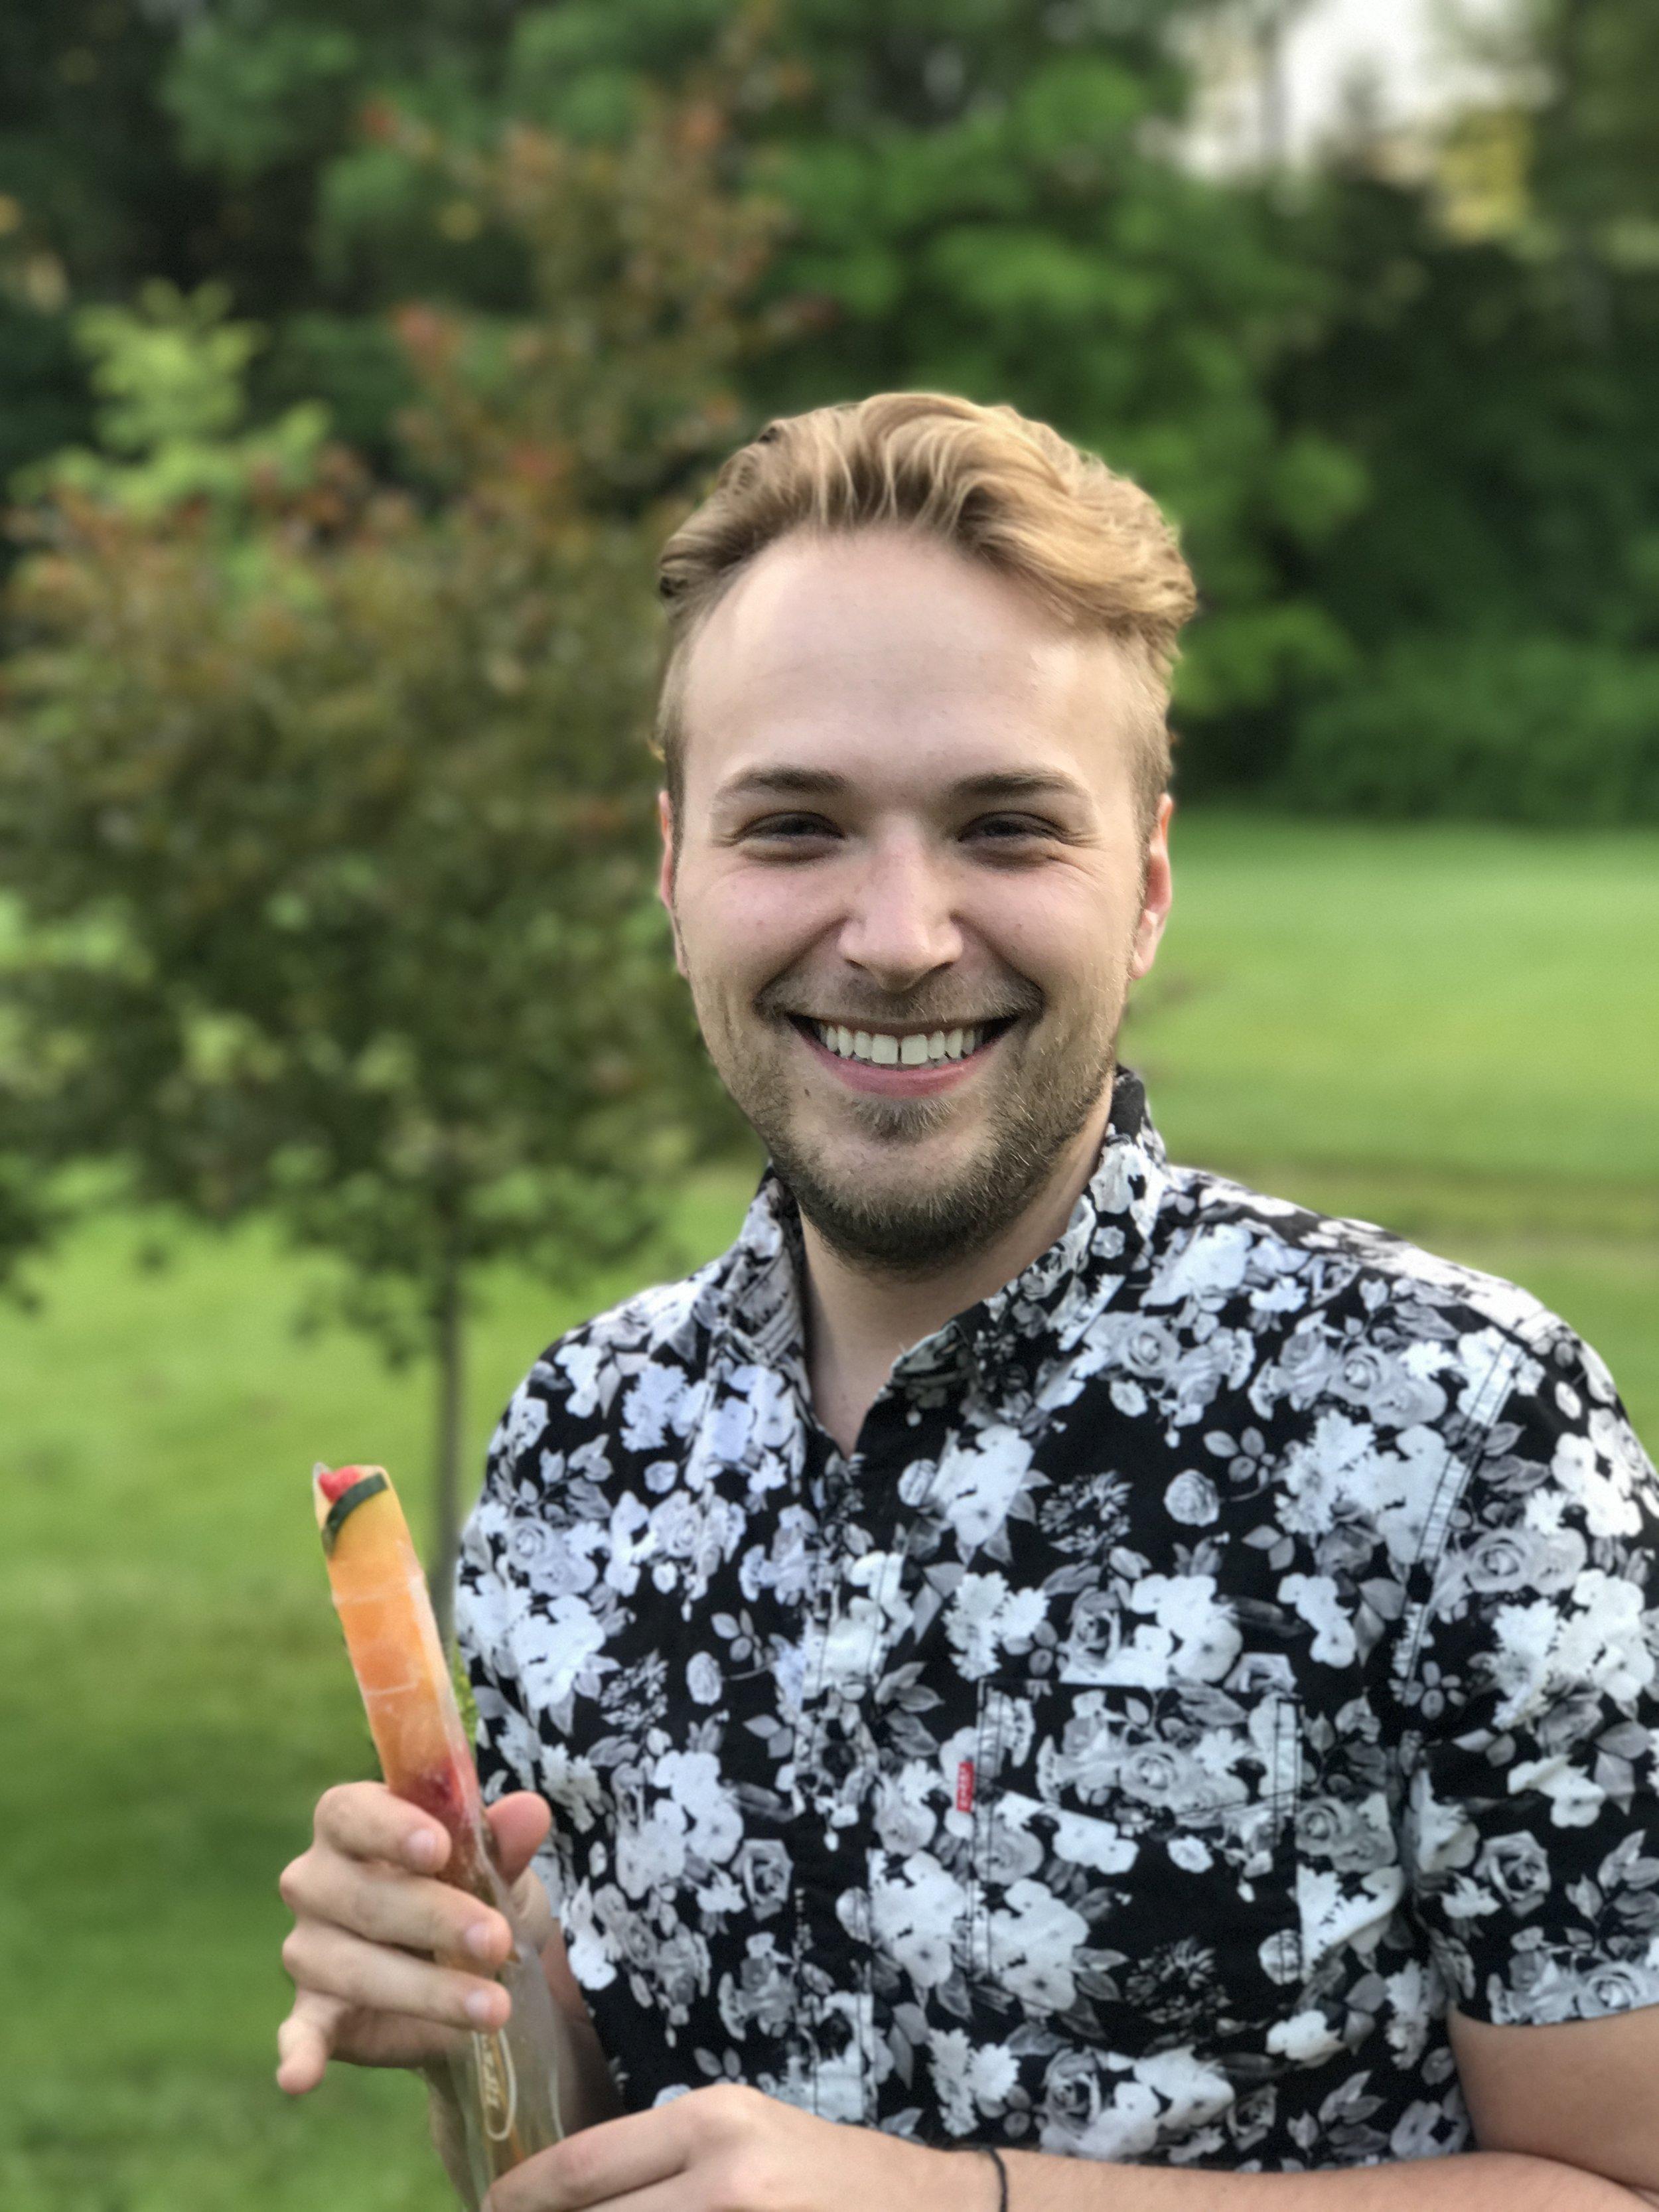 Pimm's Cup Popsicle Week 2017